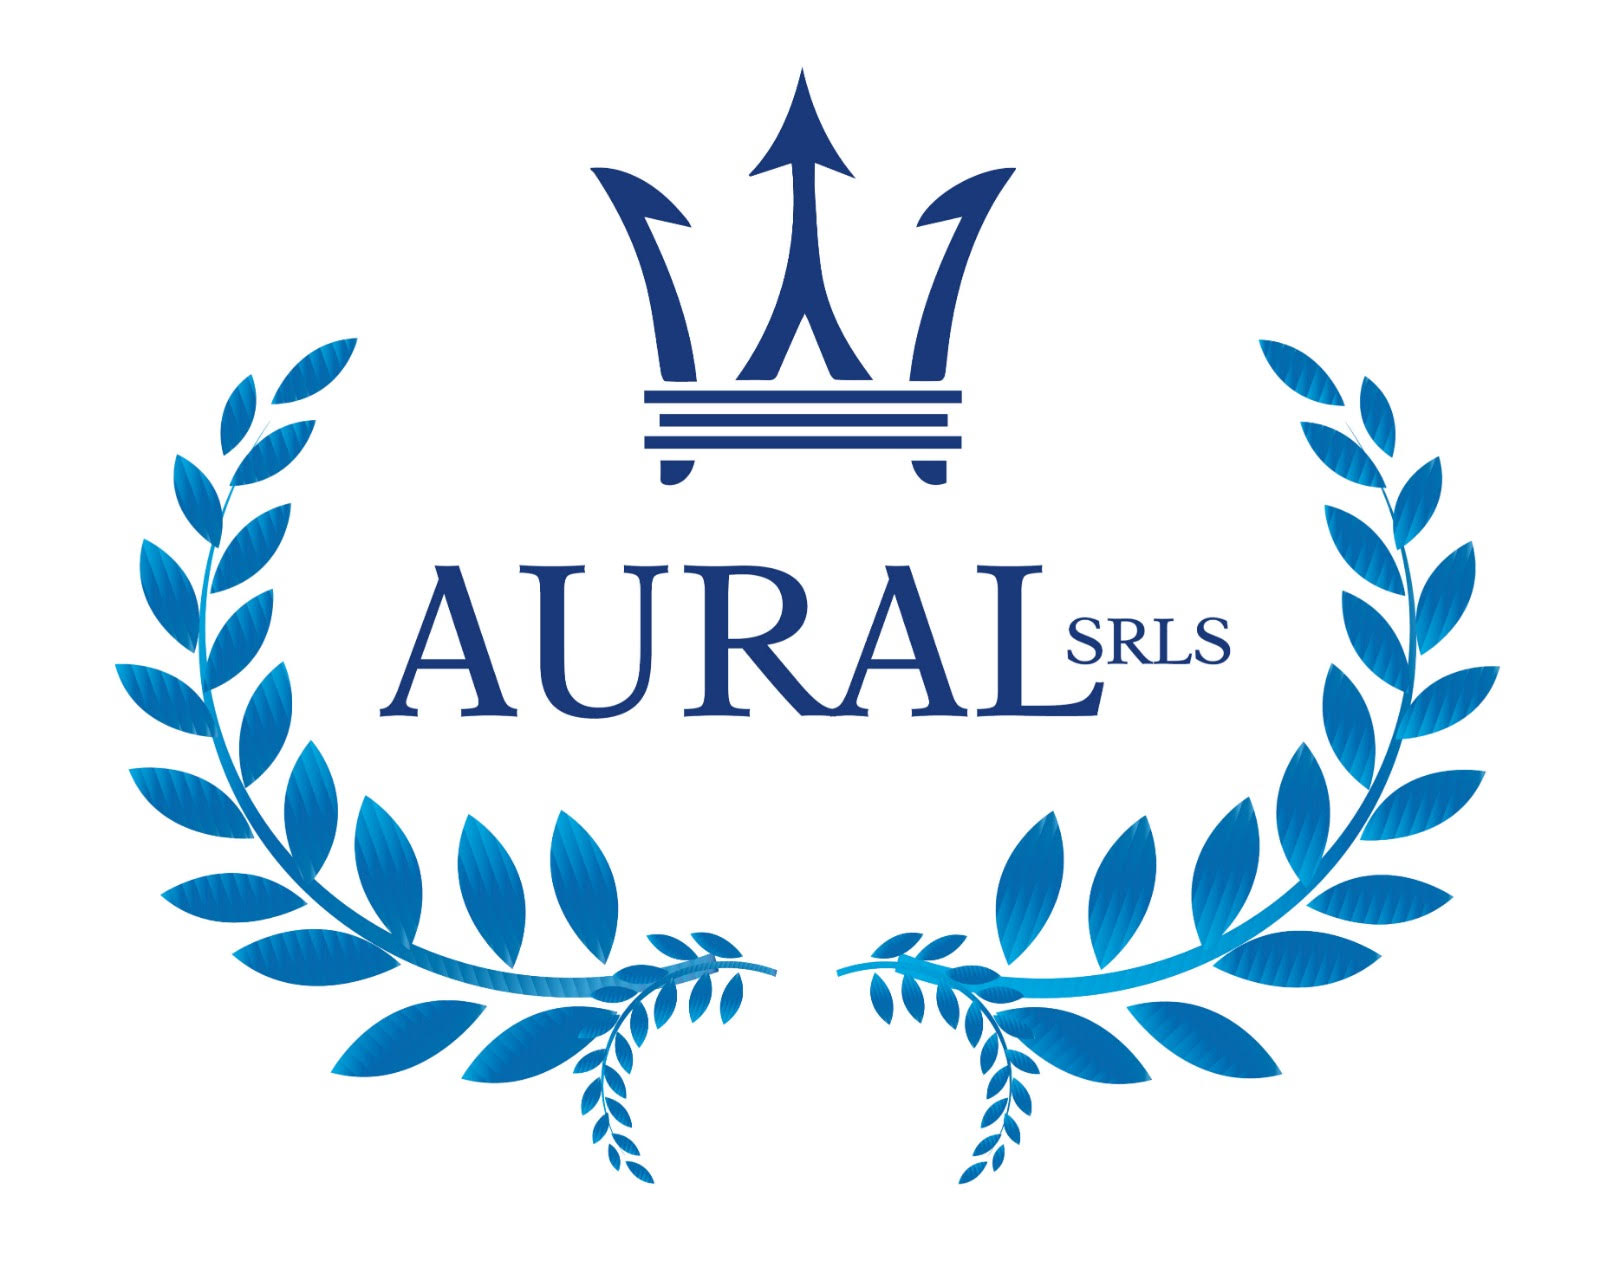 Aural: noleggio a lungo termine in convenzione per i soci!